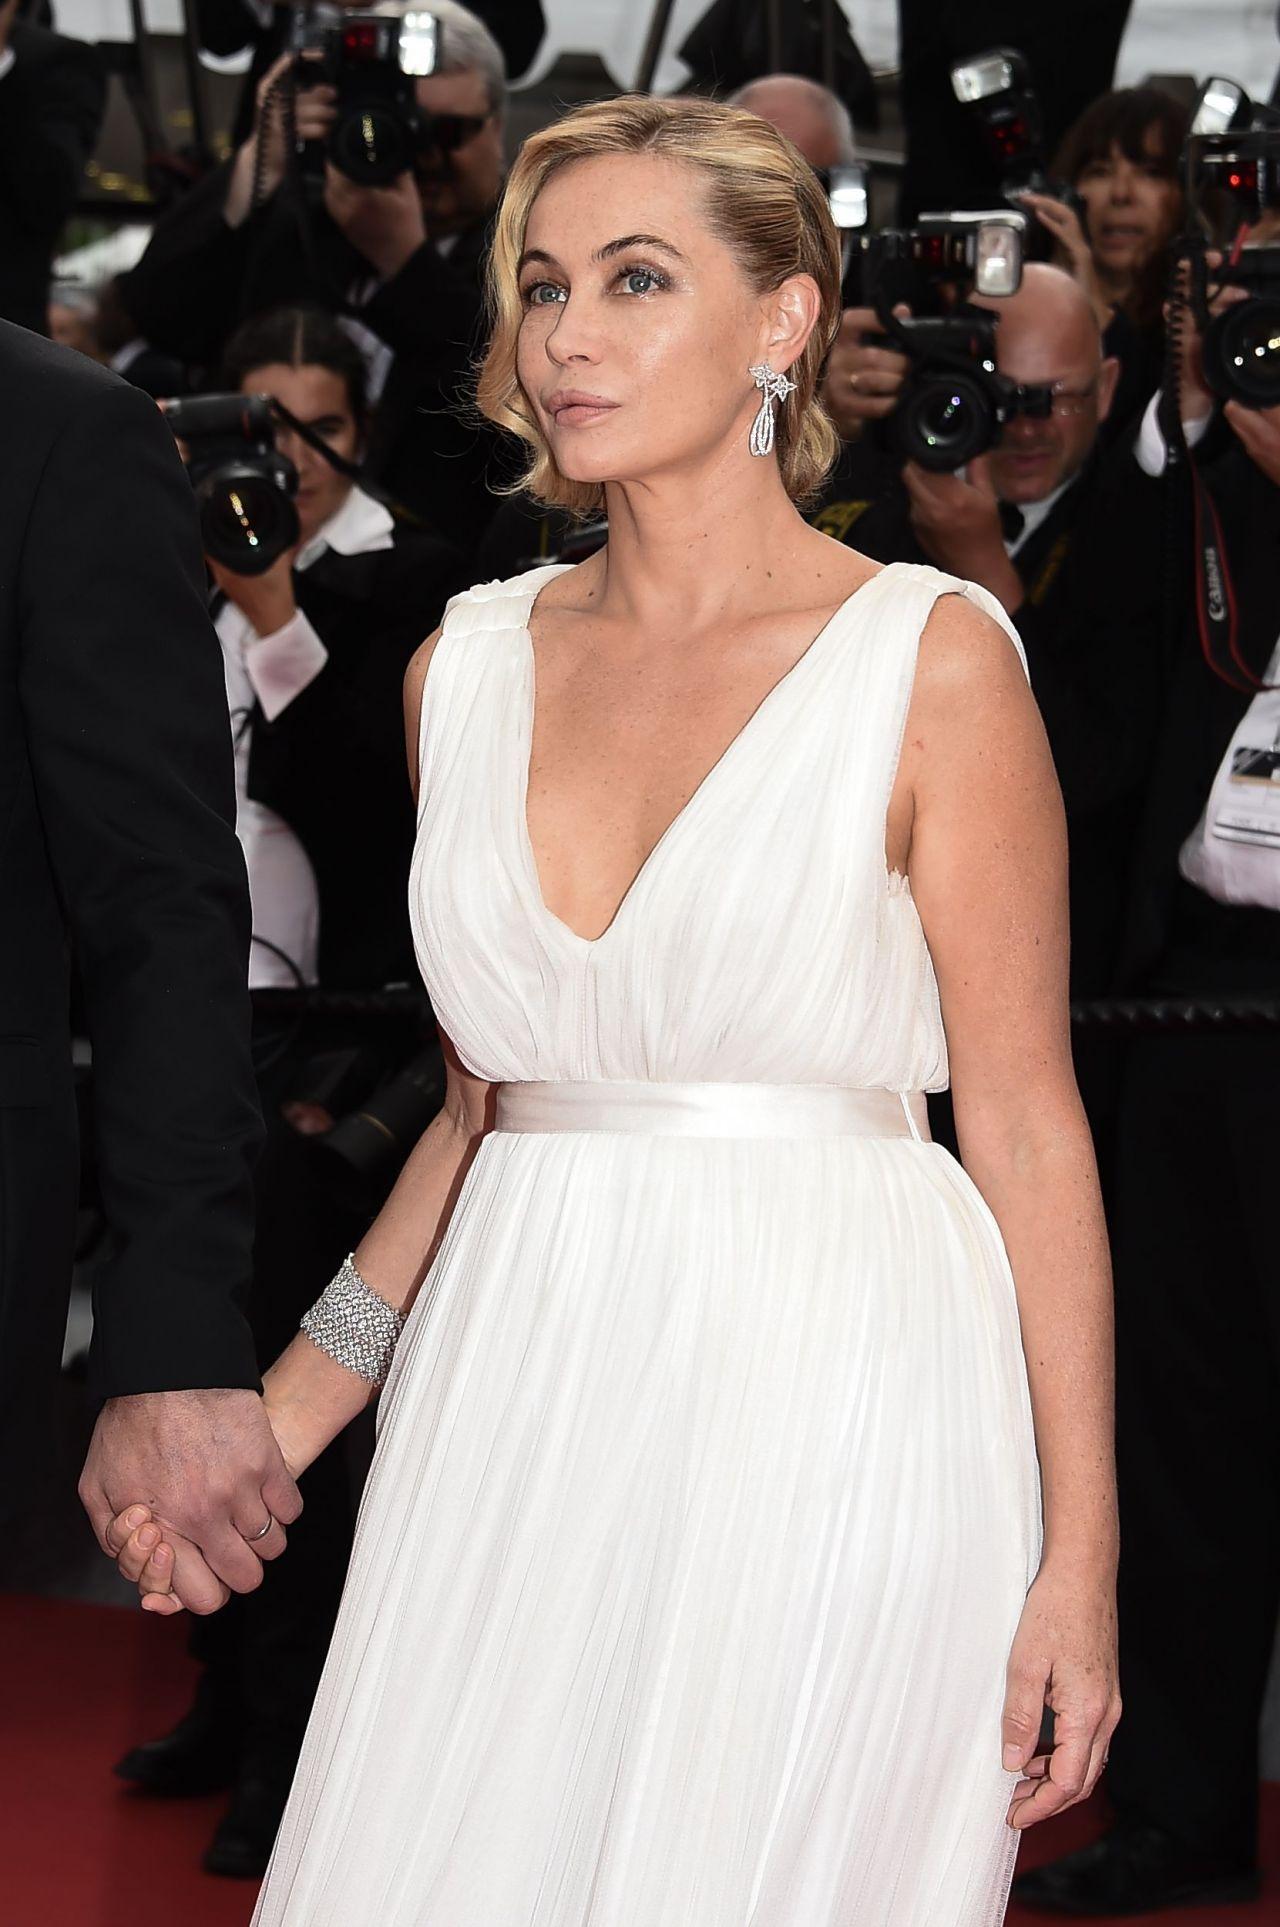 Emmanuelle Béart - Irrationnal Man Screening - 2015 Cannes Film Festival